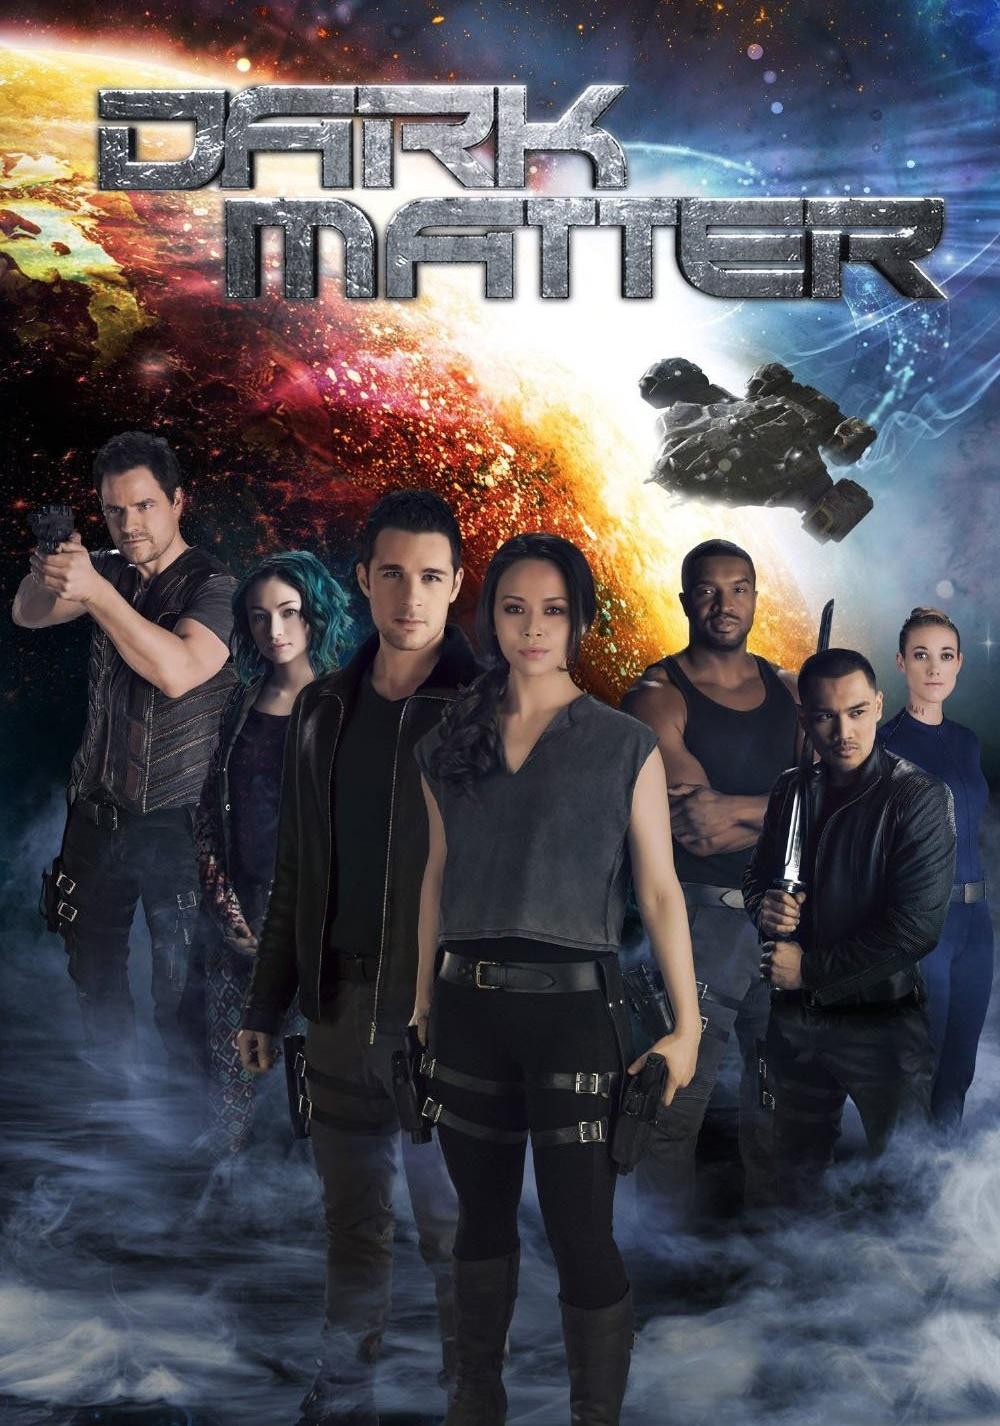 Dark Matter Cast Image Id 115085 Image Abyss